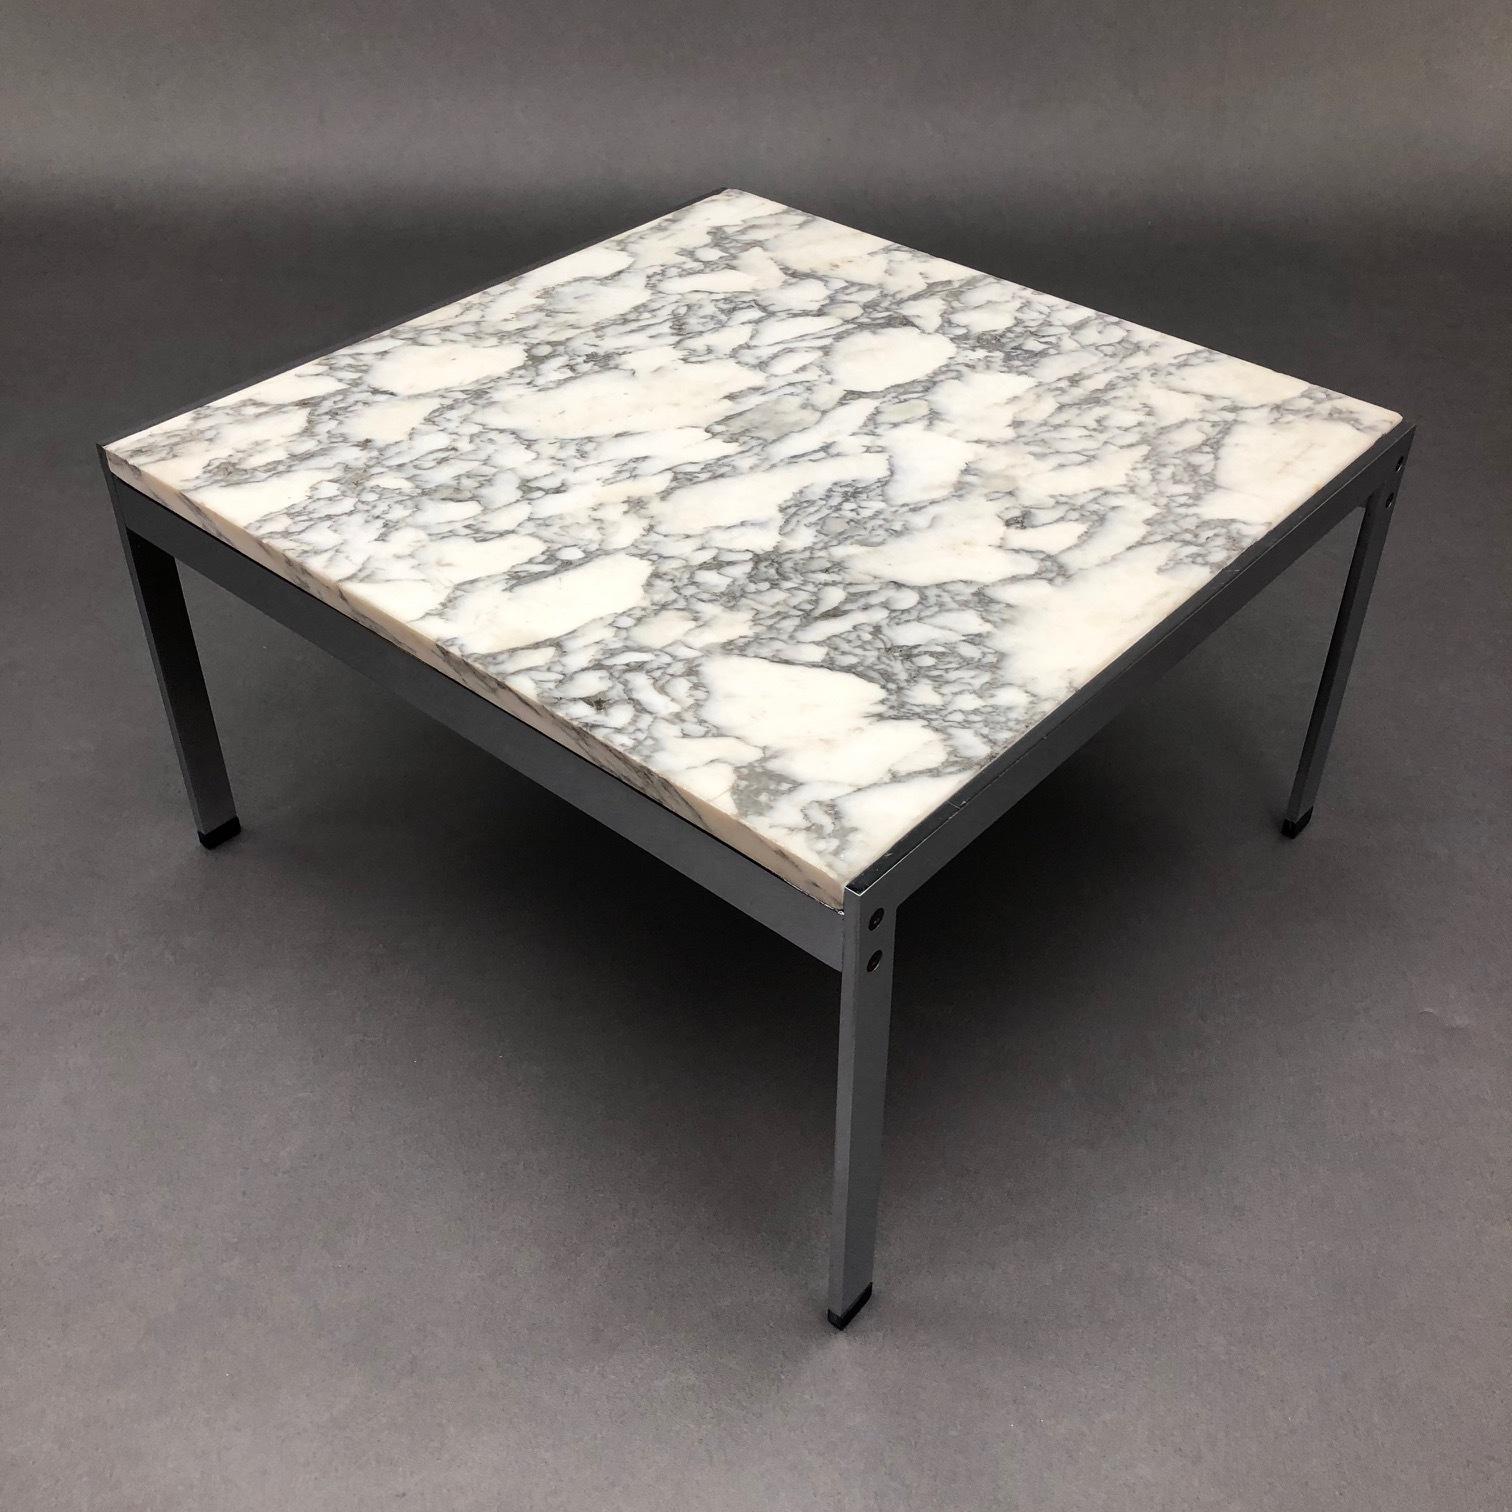 table basse marbre ann es 70 linea due. Black Bedroom Furniture Sets. Home Design Ideas